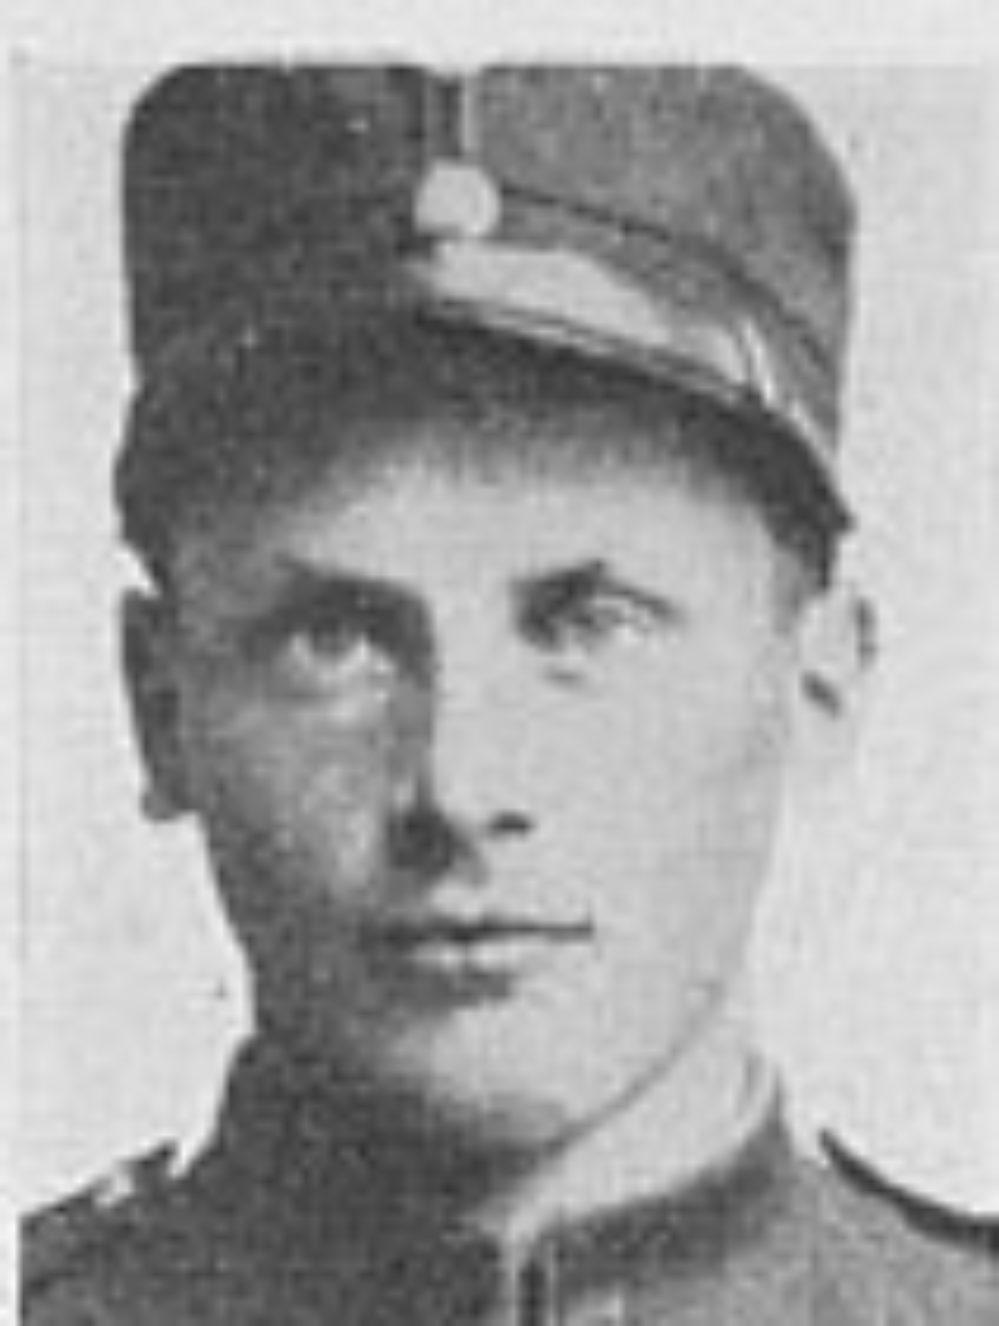 Andreas Johan Gjersdal